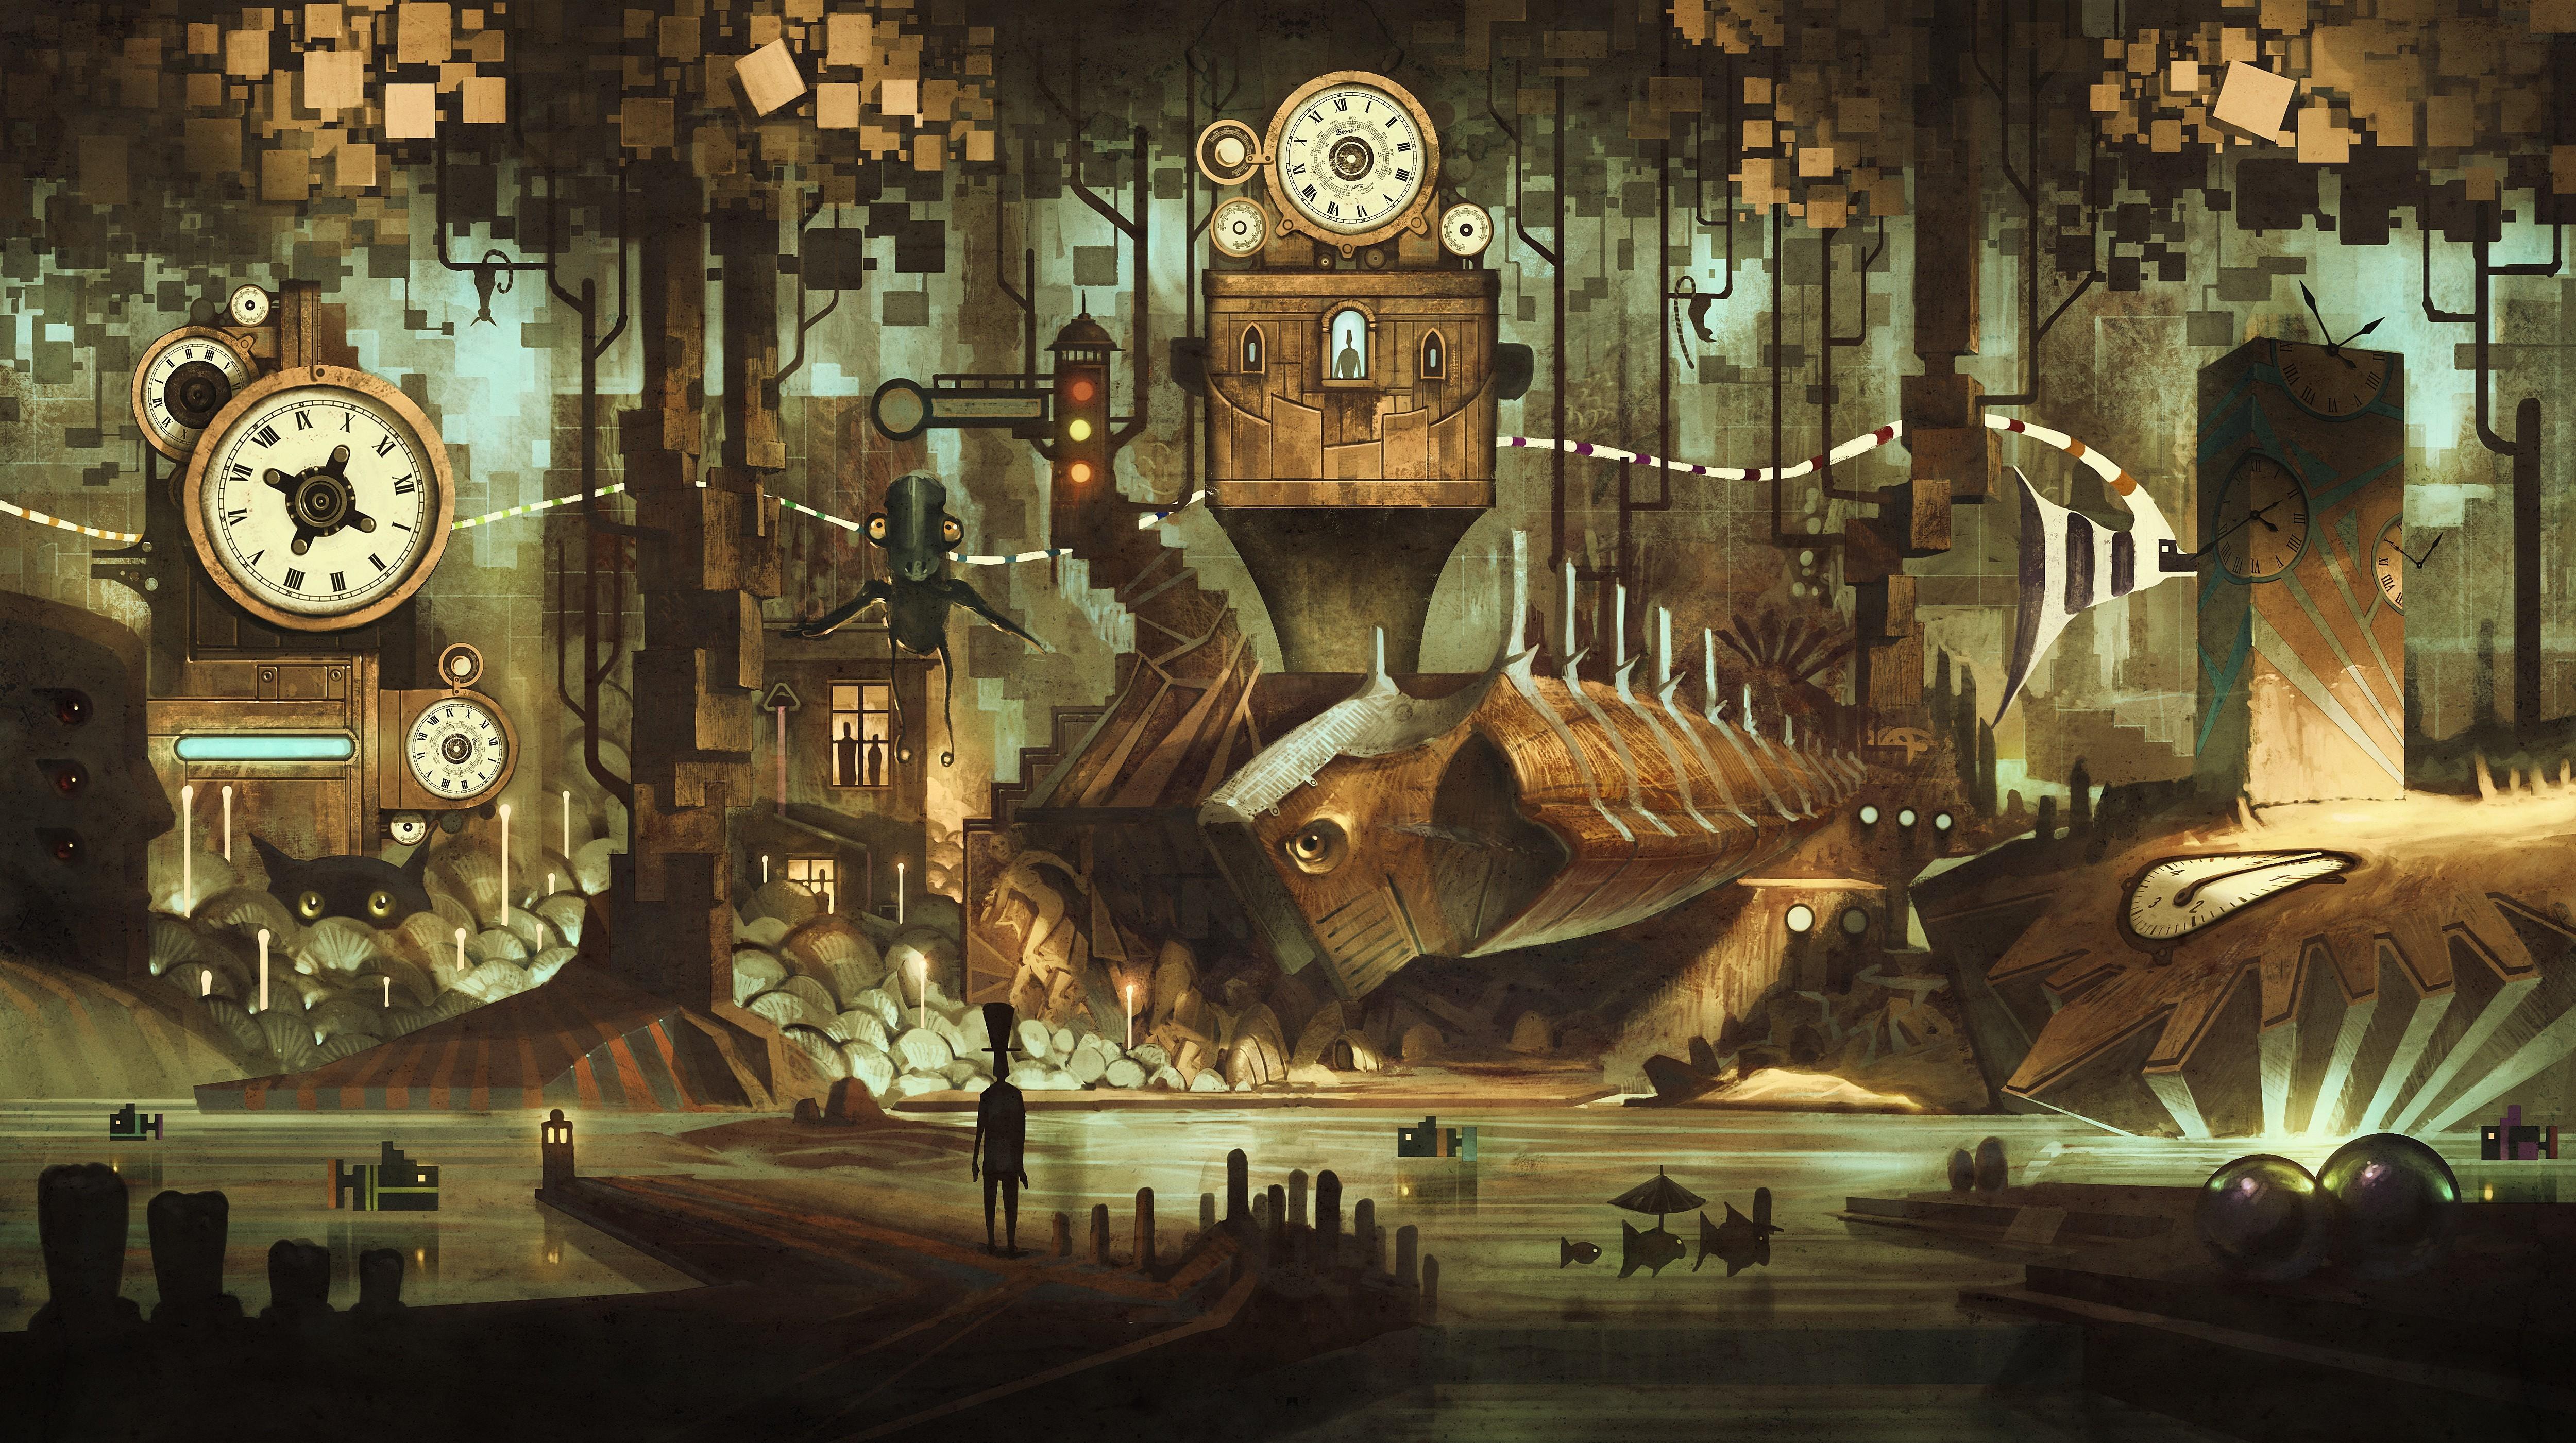 Download Wallpaper Music Steampunk - 49949-steampunk-background-5000x2801-mobile  HD_187870.jpg